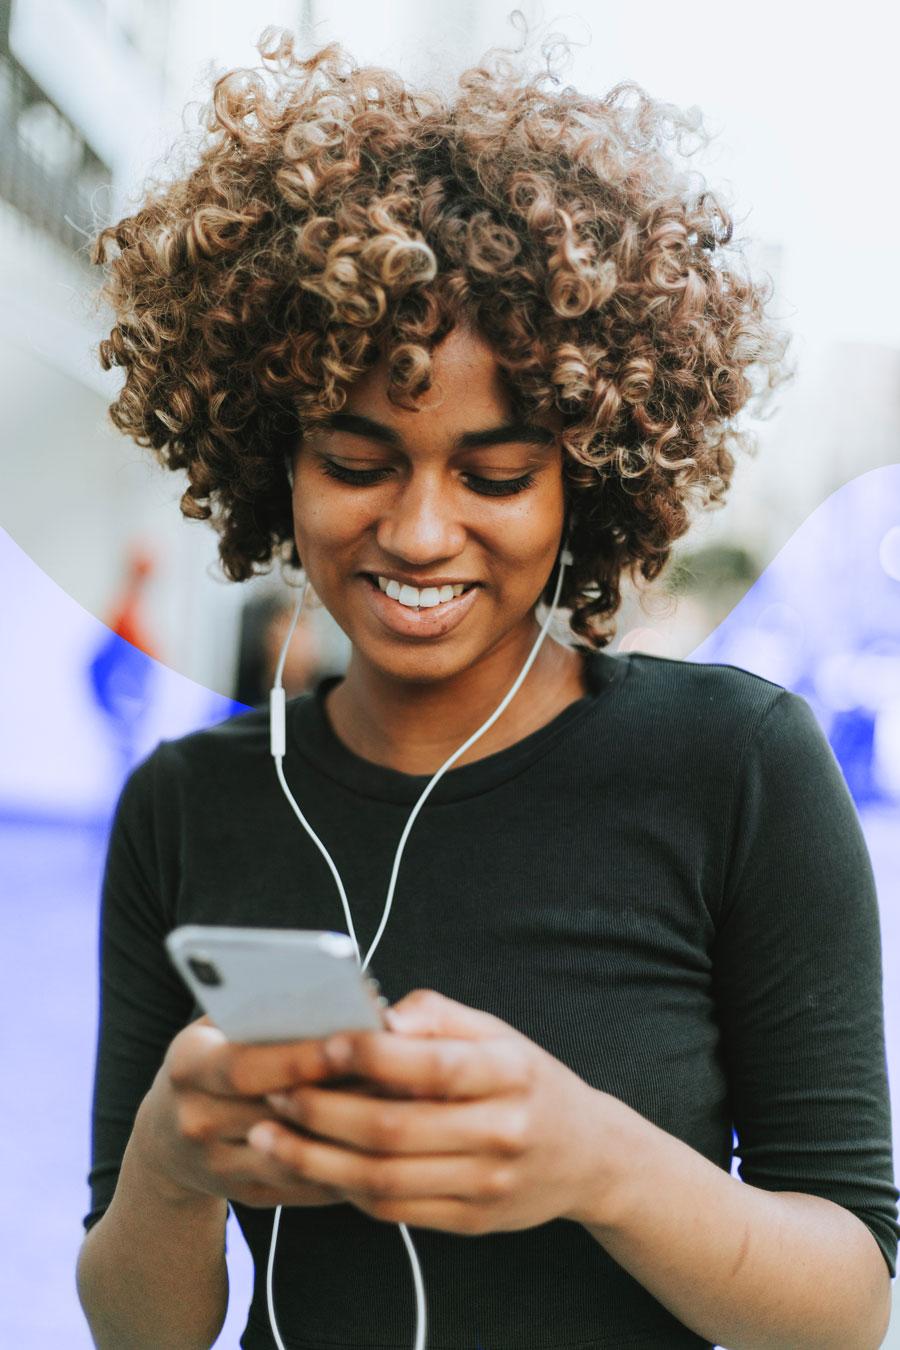 phone-happy.jpg